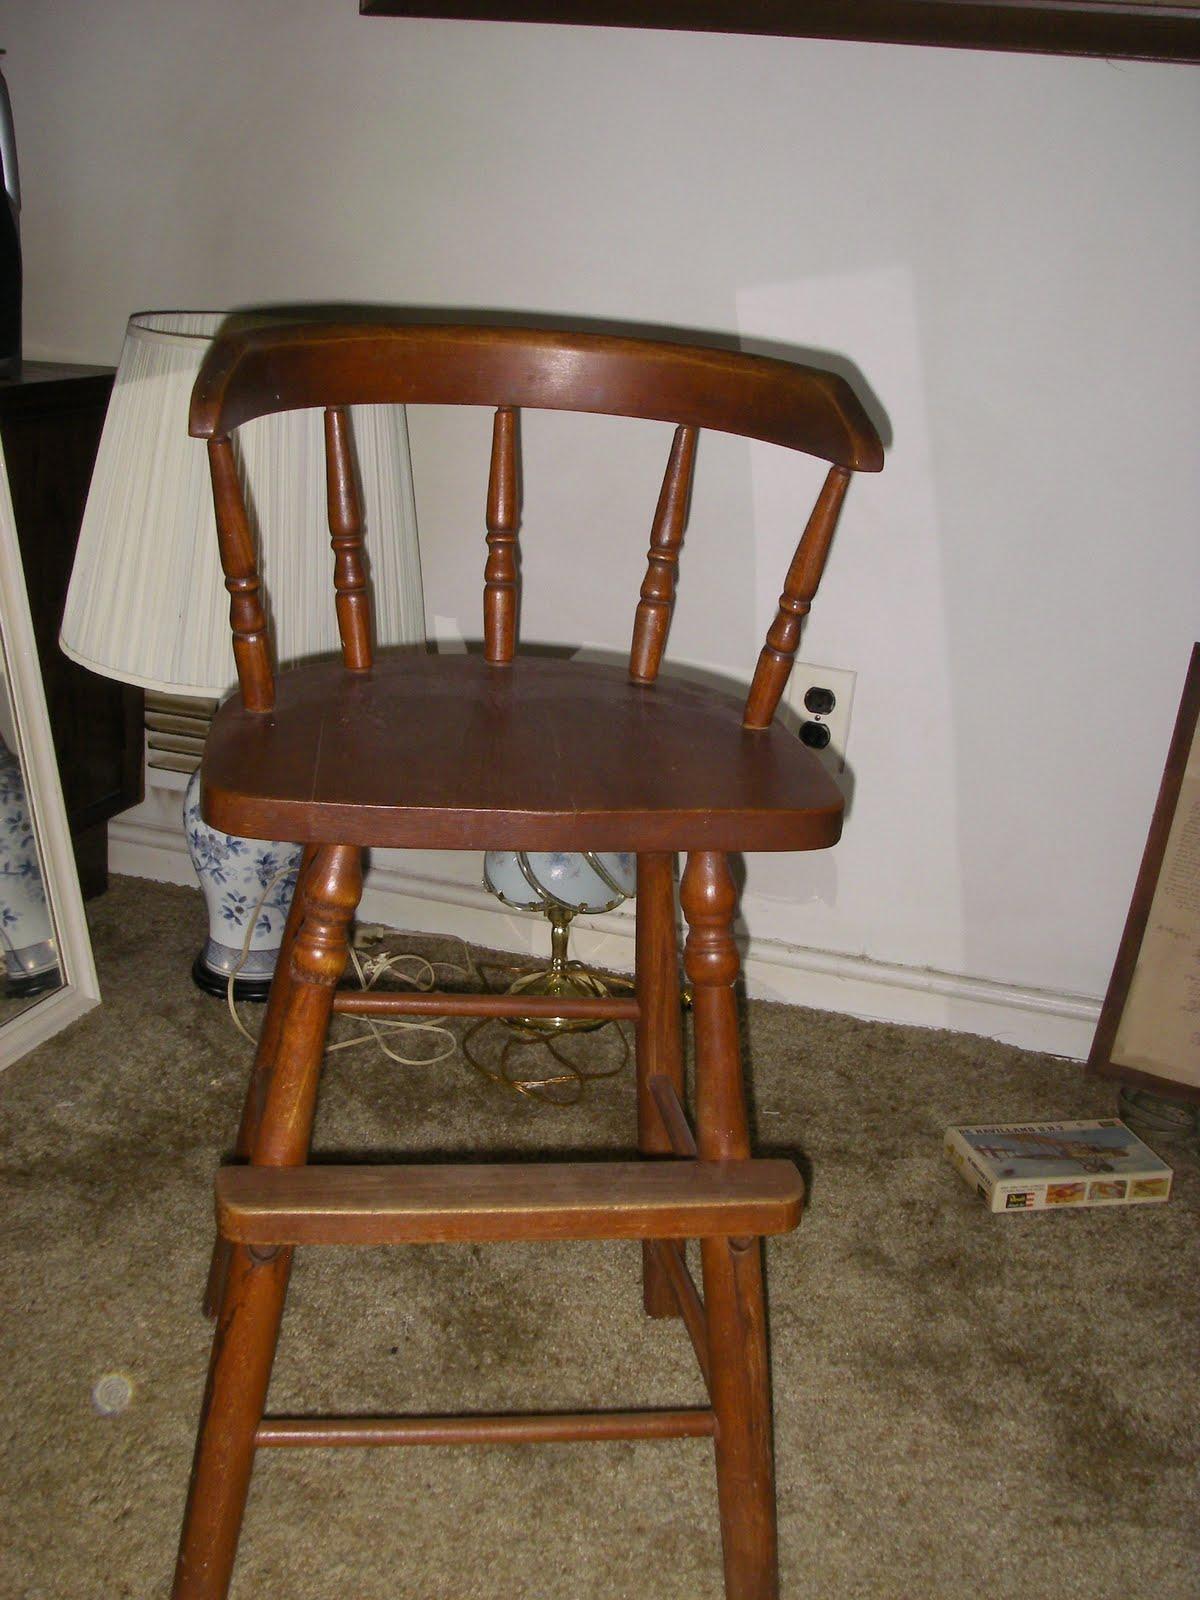 Yard sale furniture estate sale old high chair for Furniture yard sale